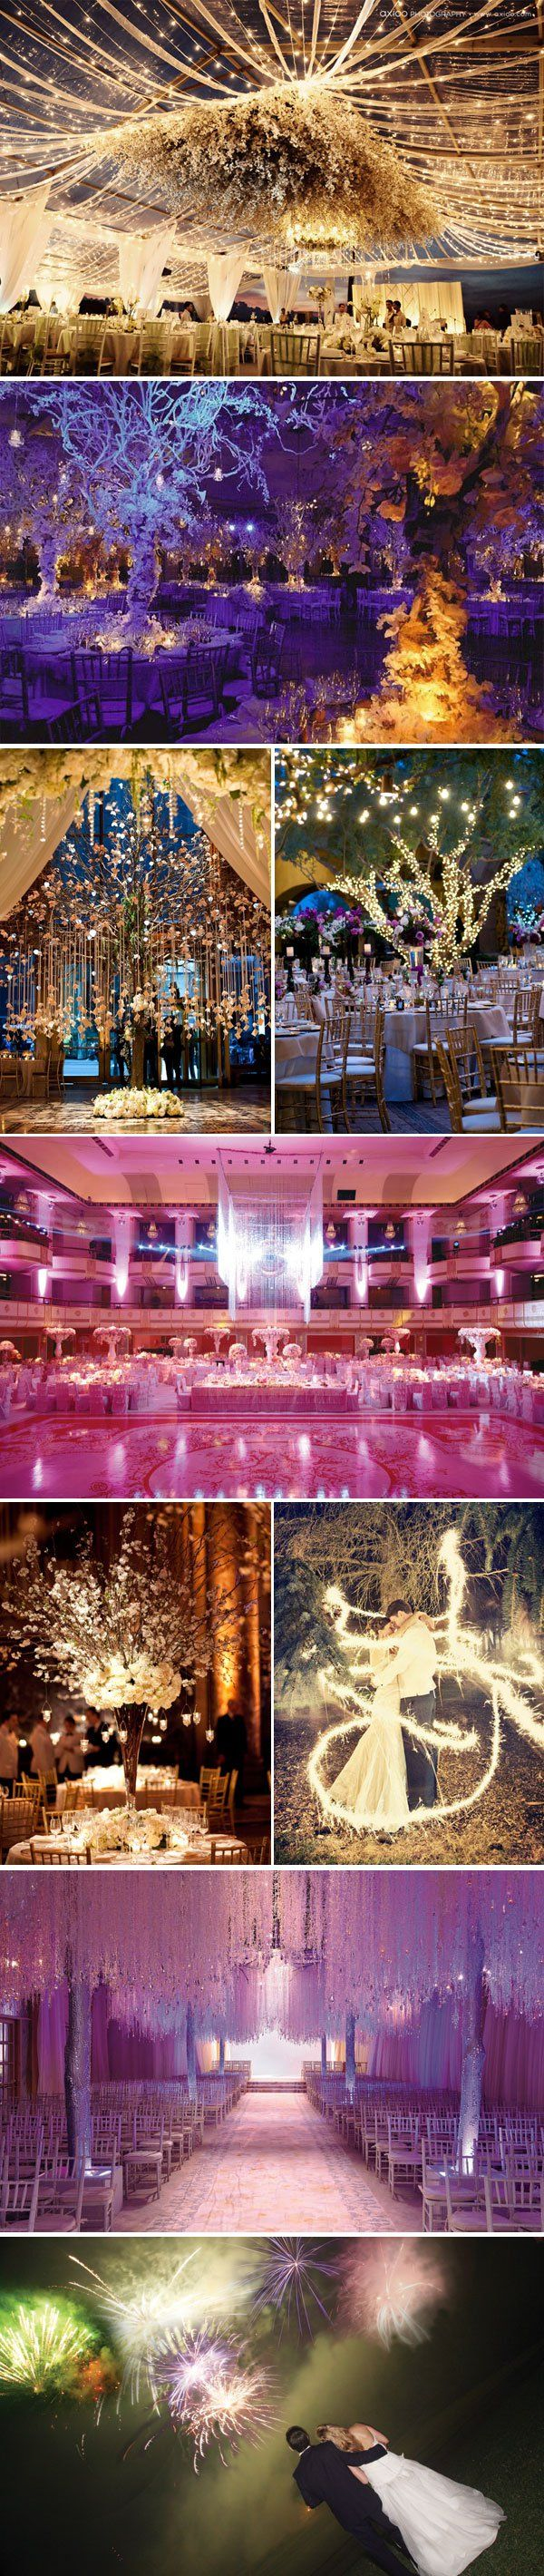 High Drama Wedding Decor jeanandleigh.com events <3 party <3 love